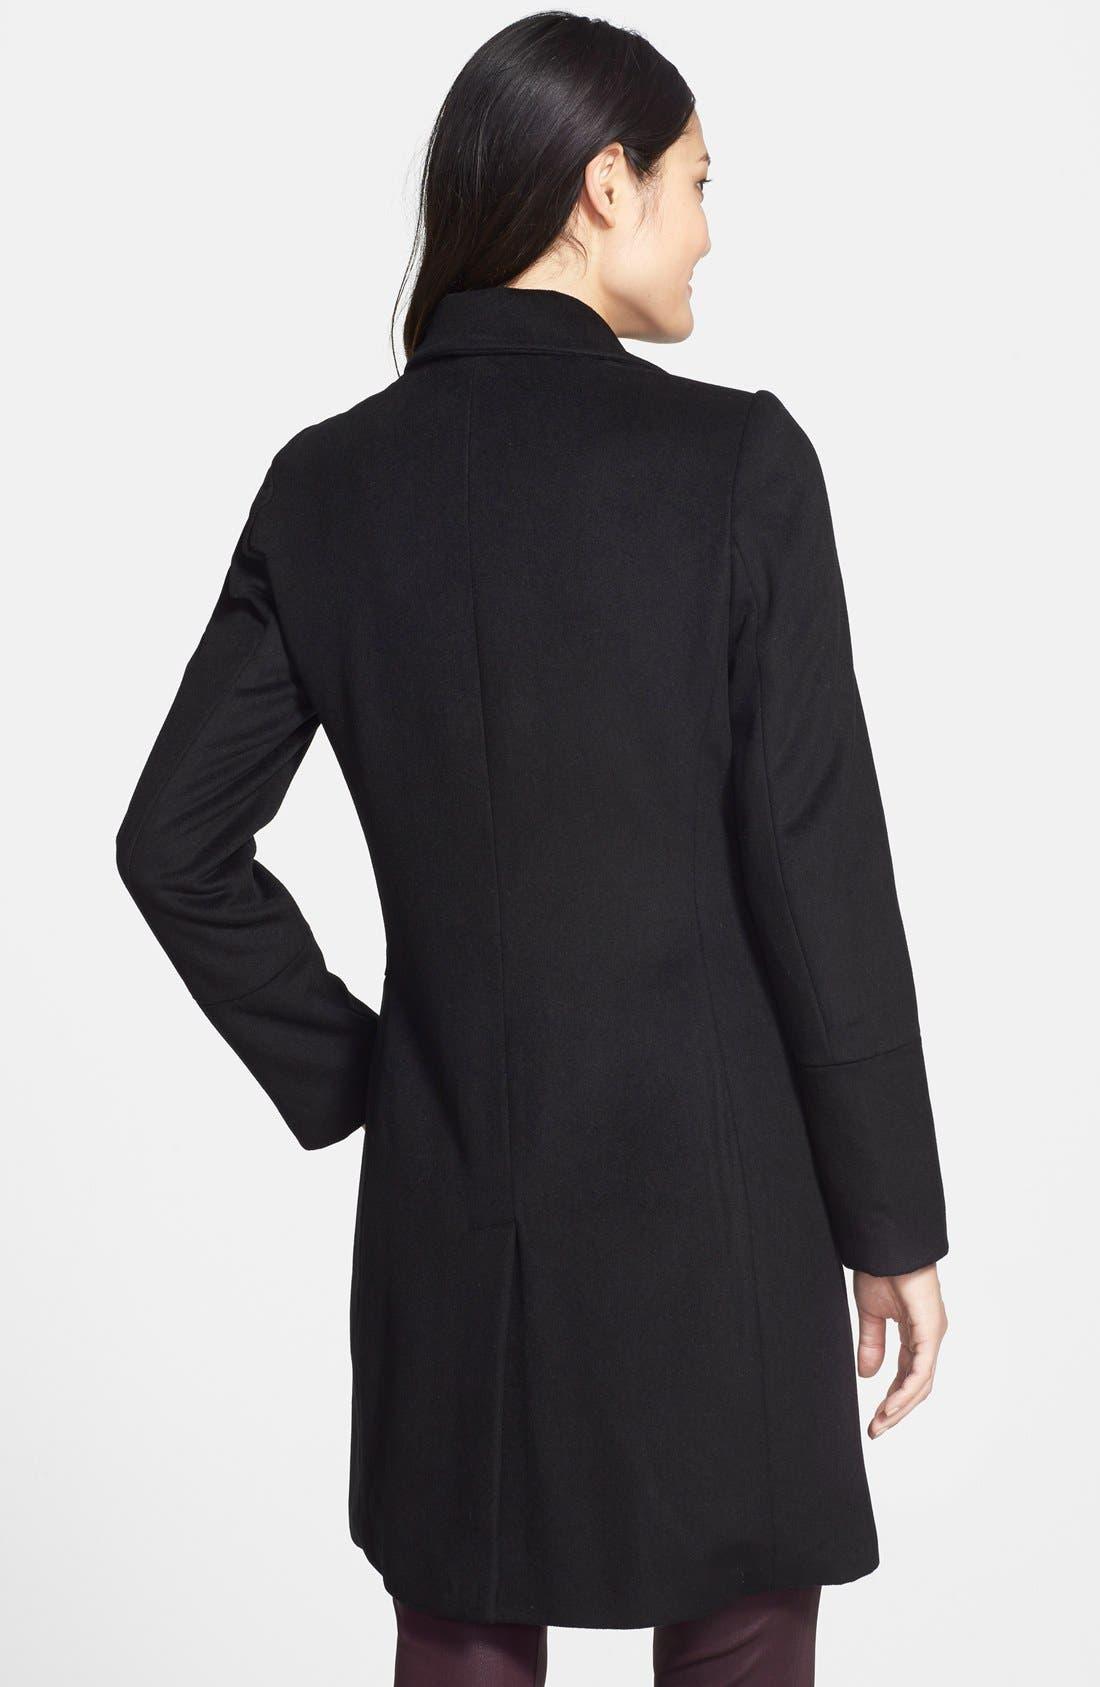 CALVIN KLEIN,                             Notch Collar Wool Blend Coat,                             Alternate thumbnail 2, color,                             001